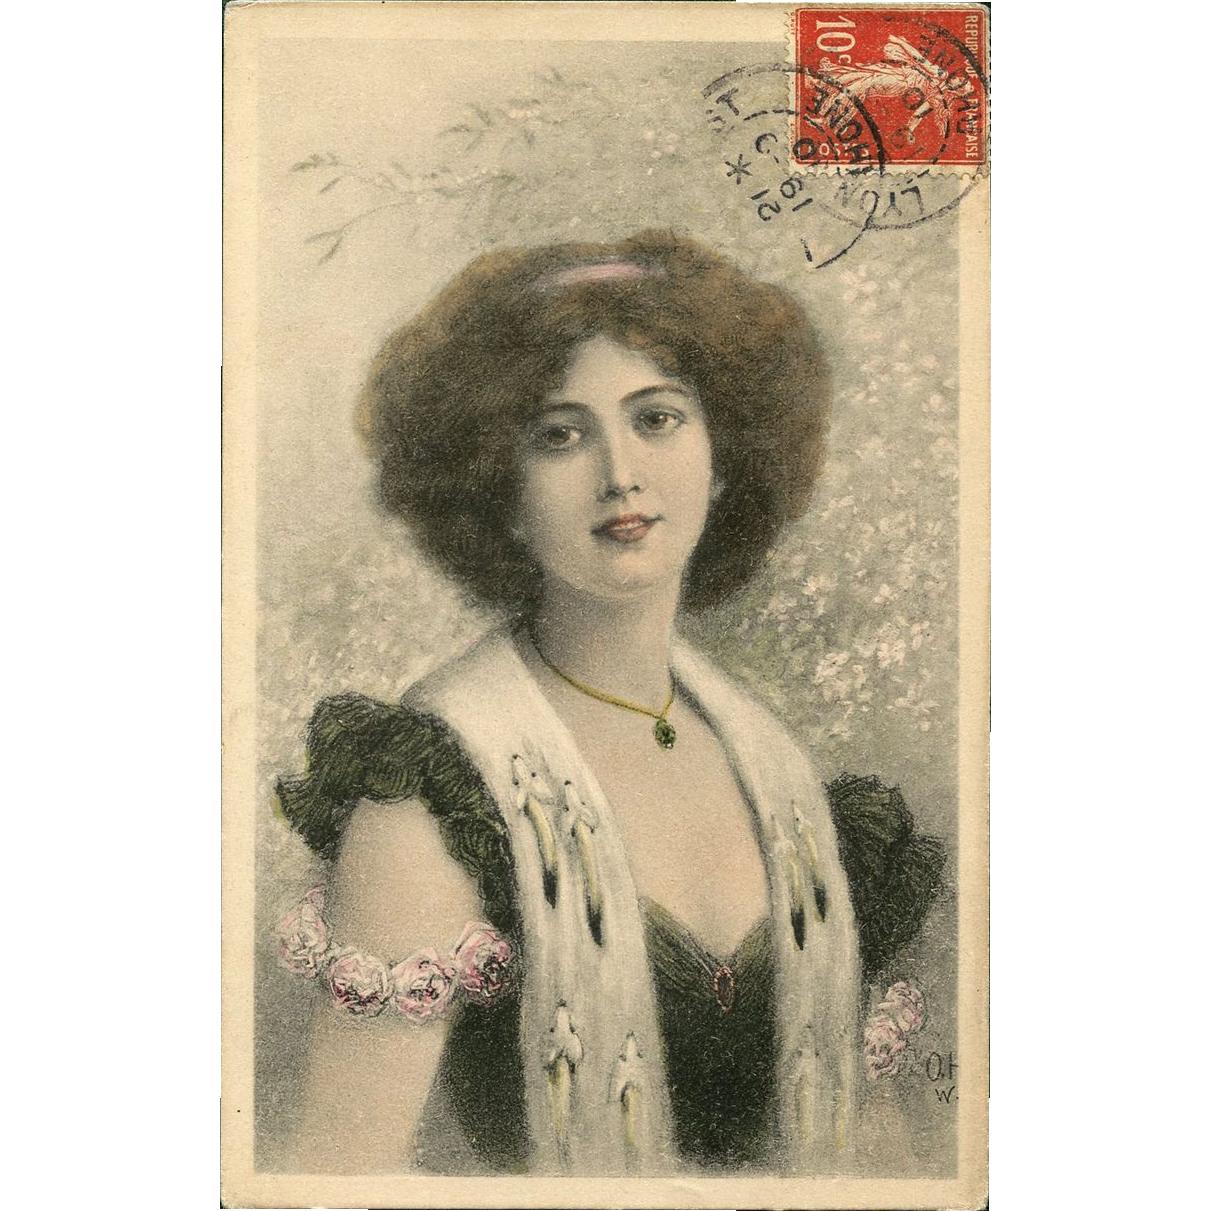 Woman in ERMINE fur stole Illustration 1910 German lithograph postcard